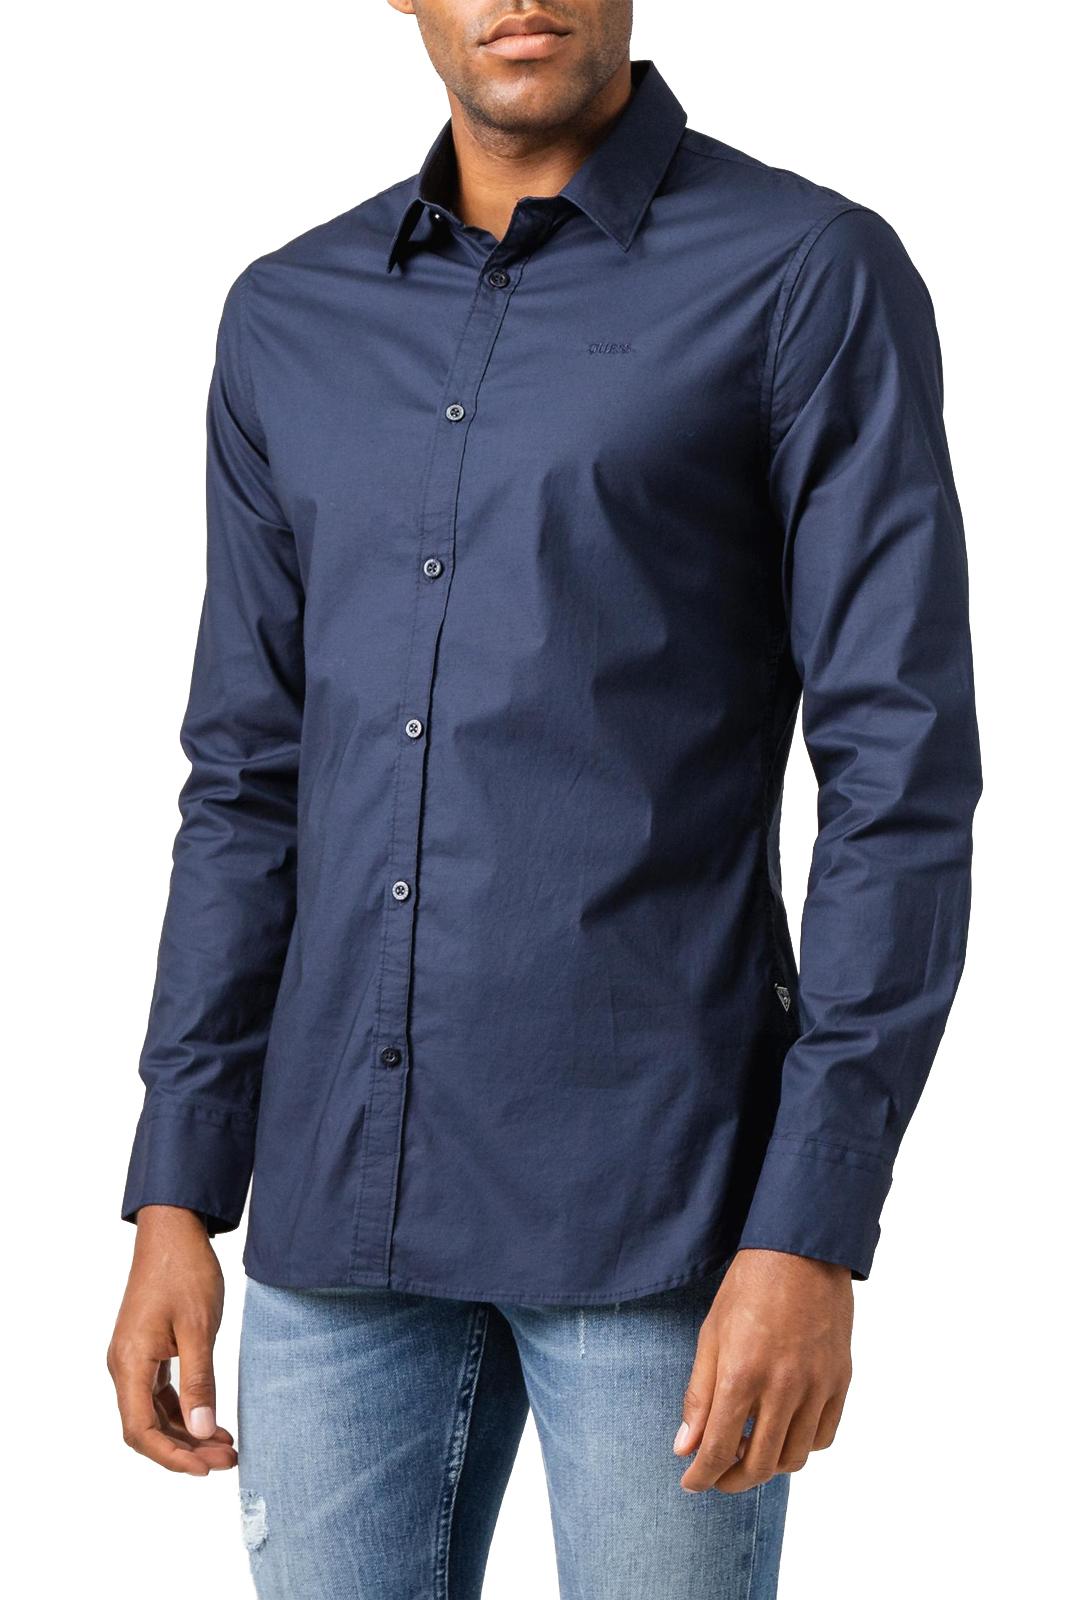 Chemises manches longues  Guess jeans M94H20 WCC70 SUNSET SHIRT G720 BLUE NAVY